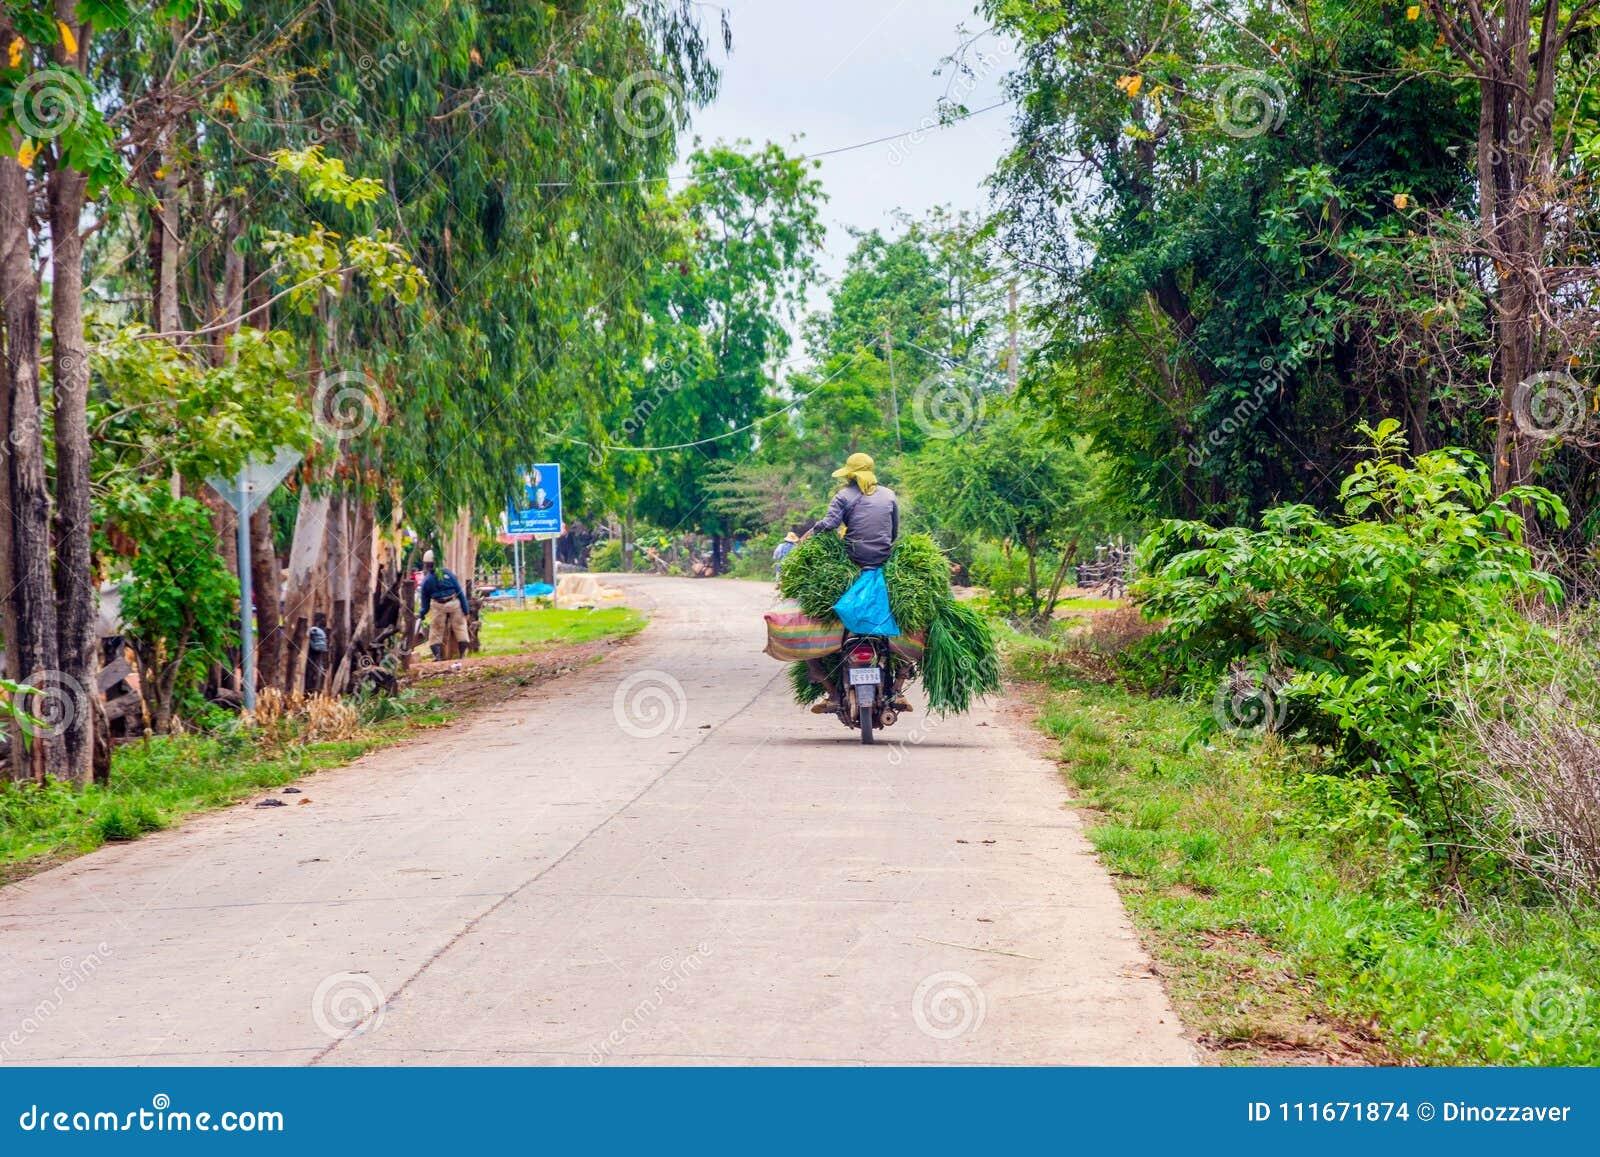 Motorbike Transferring Fresh Rice, Cambodia Editorial Stock Image